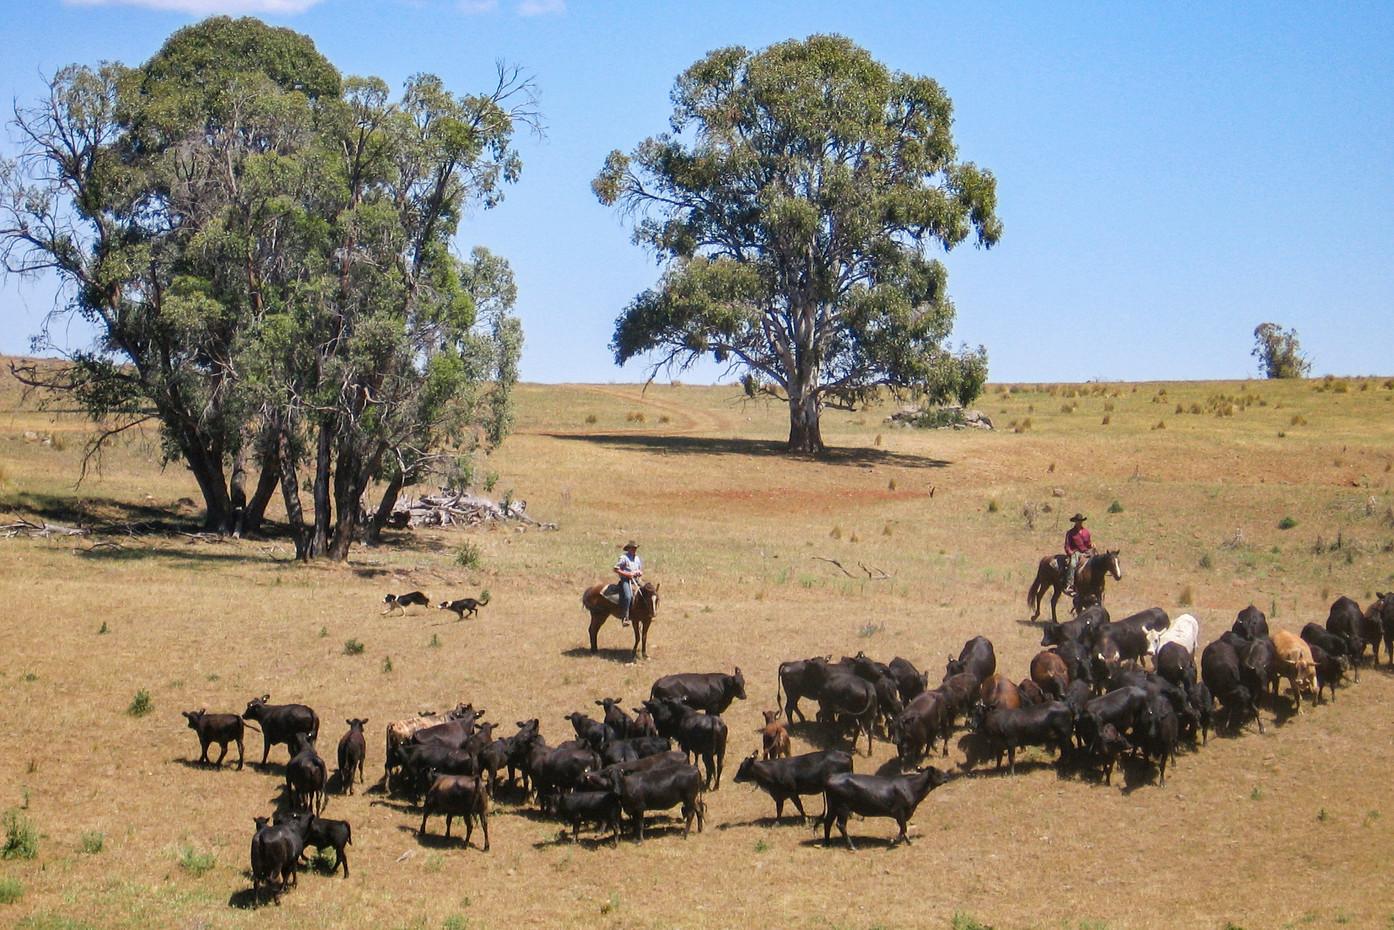 Jackaroos in the Blue Mountains, Australia